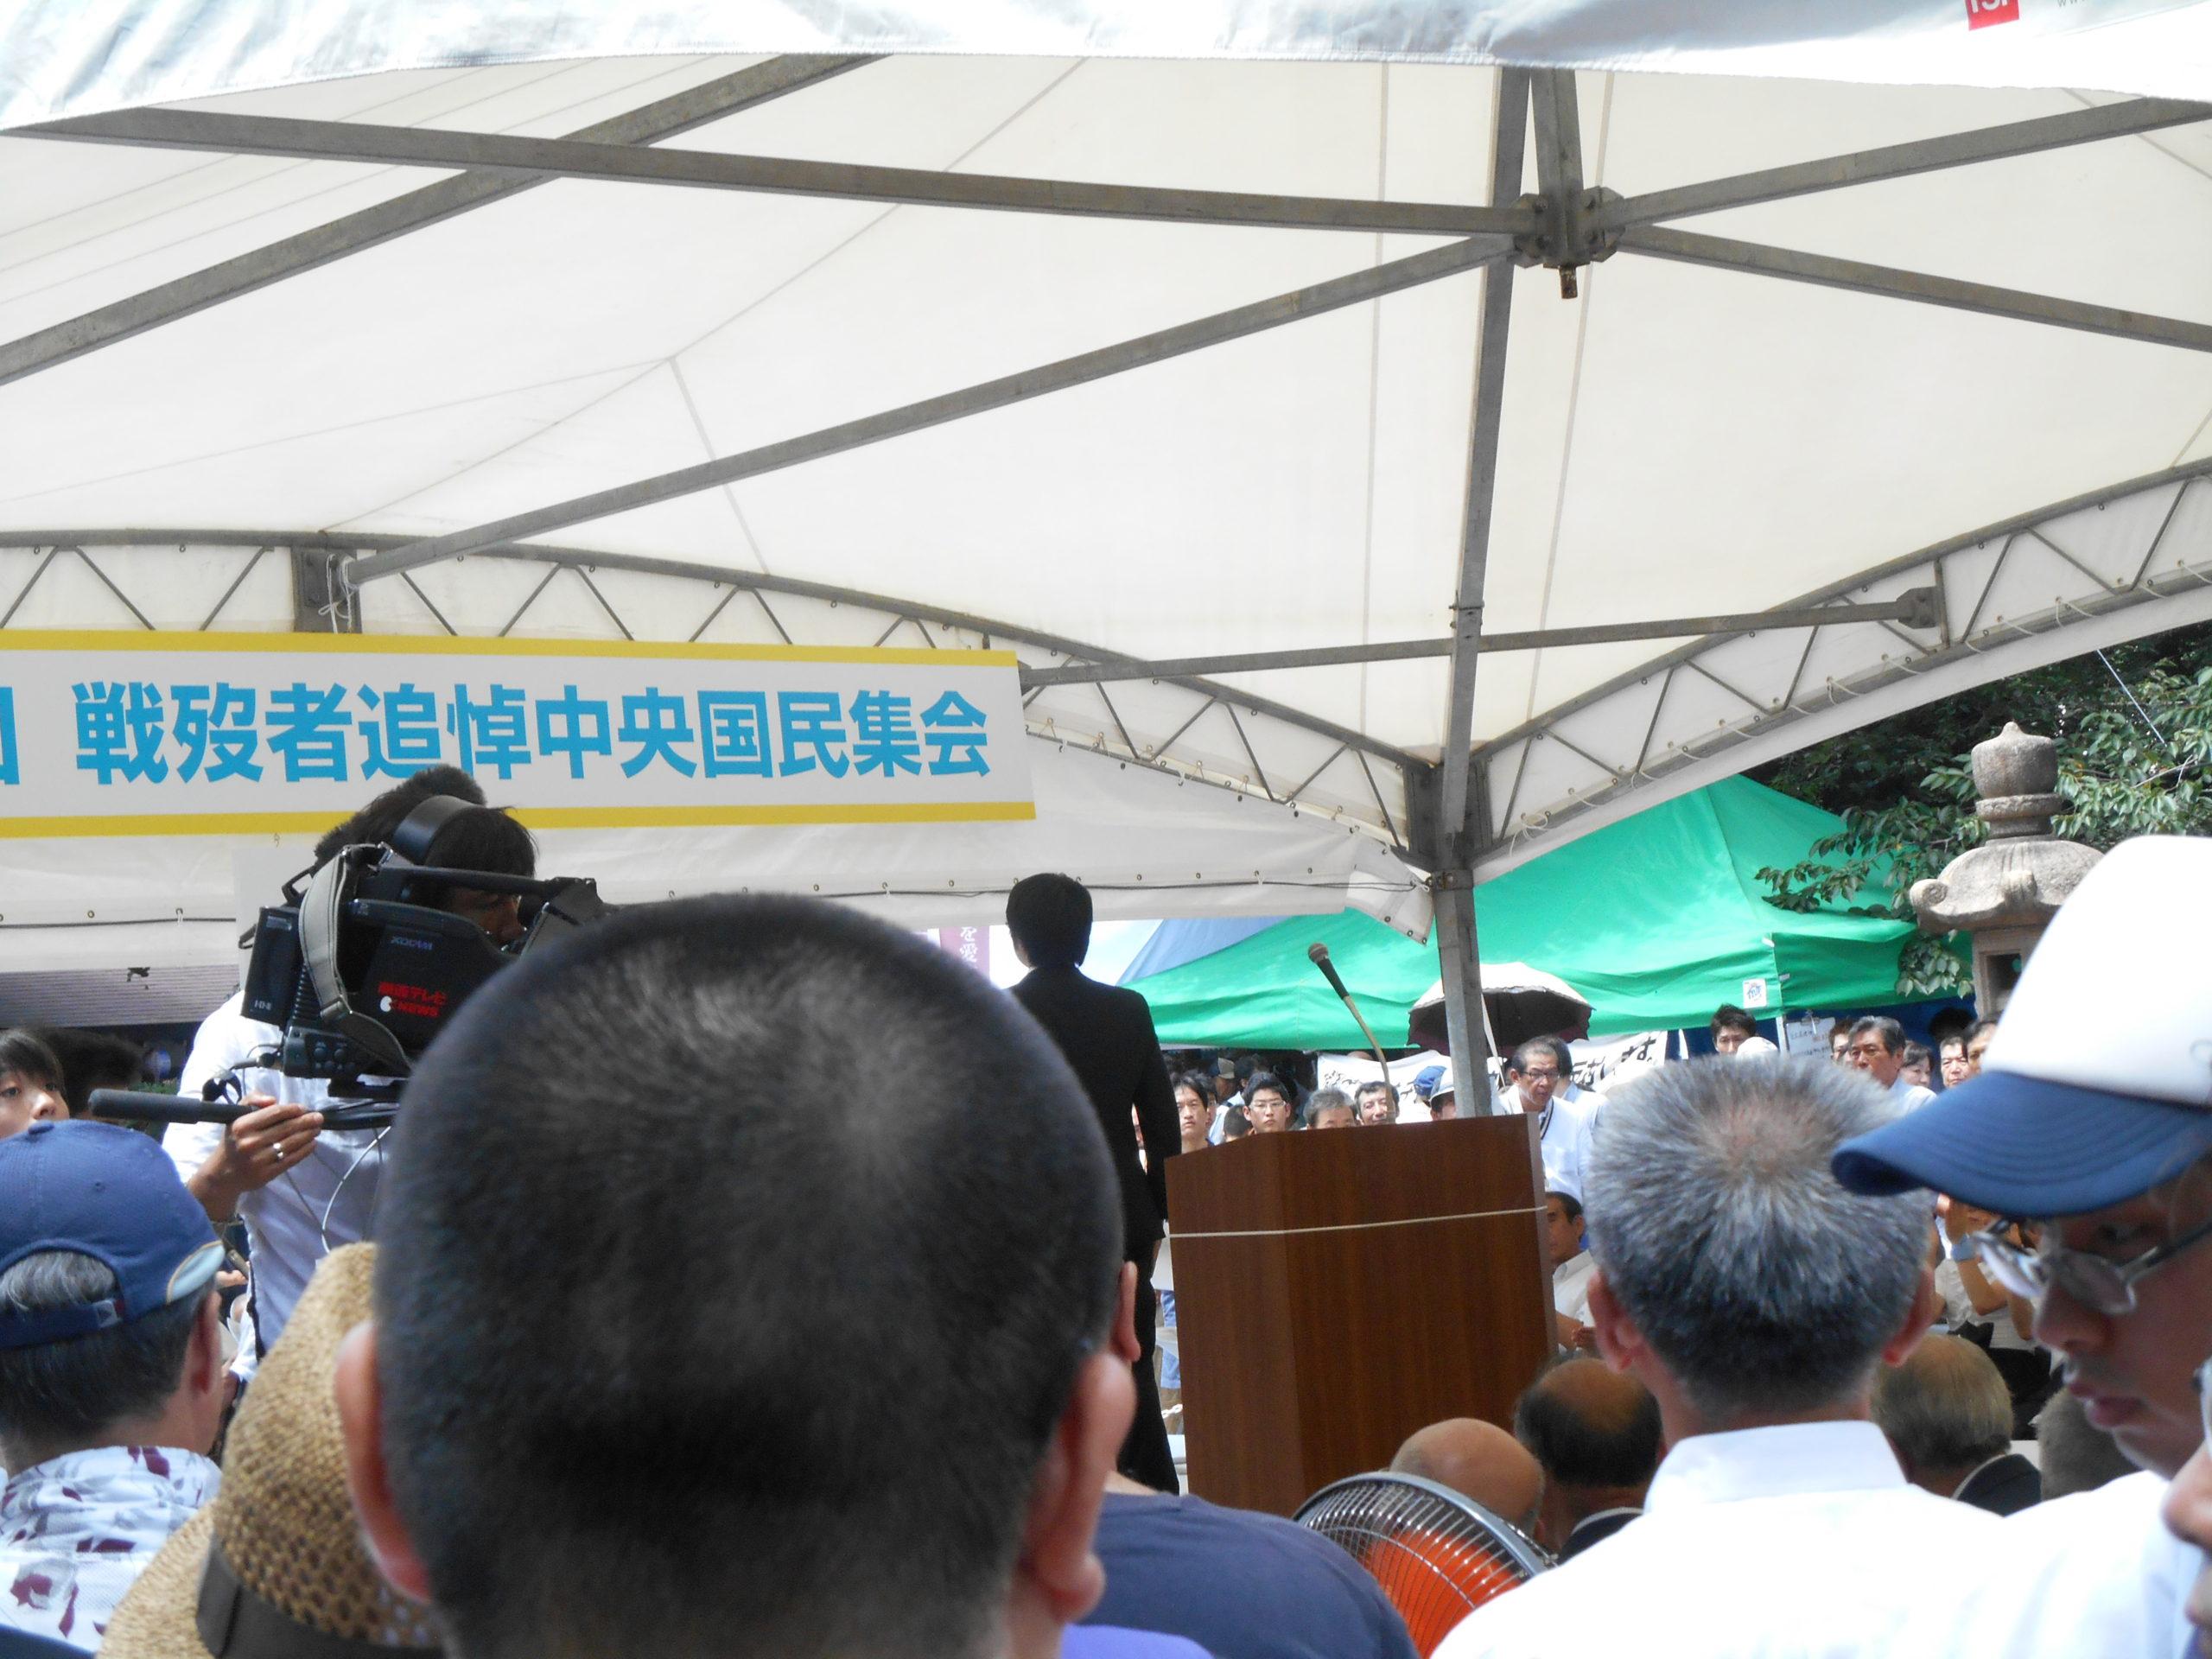 DSCN1106 scaled - 8月15日終戦記念日